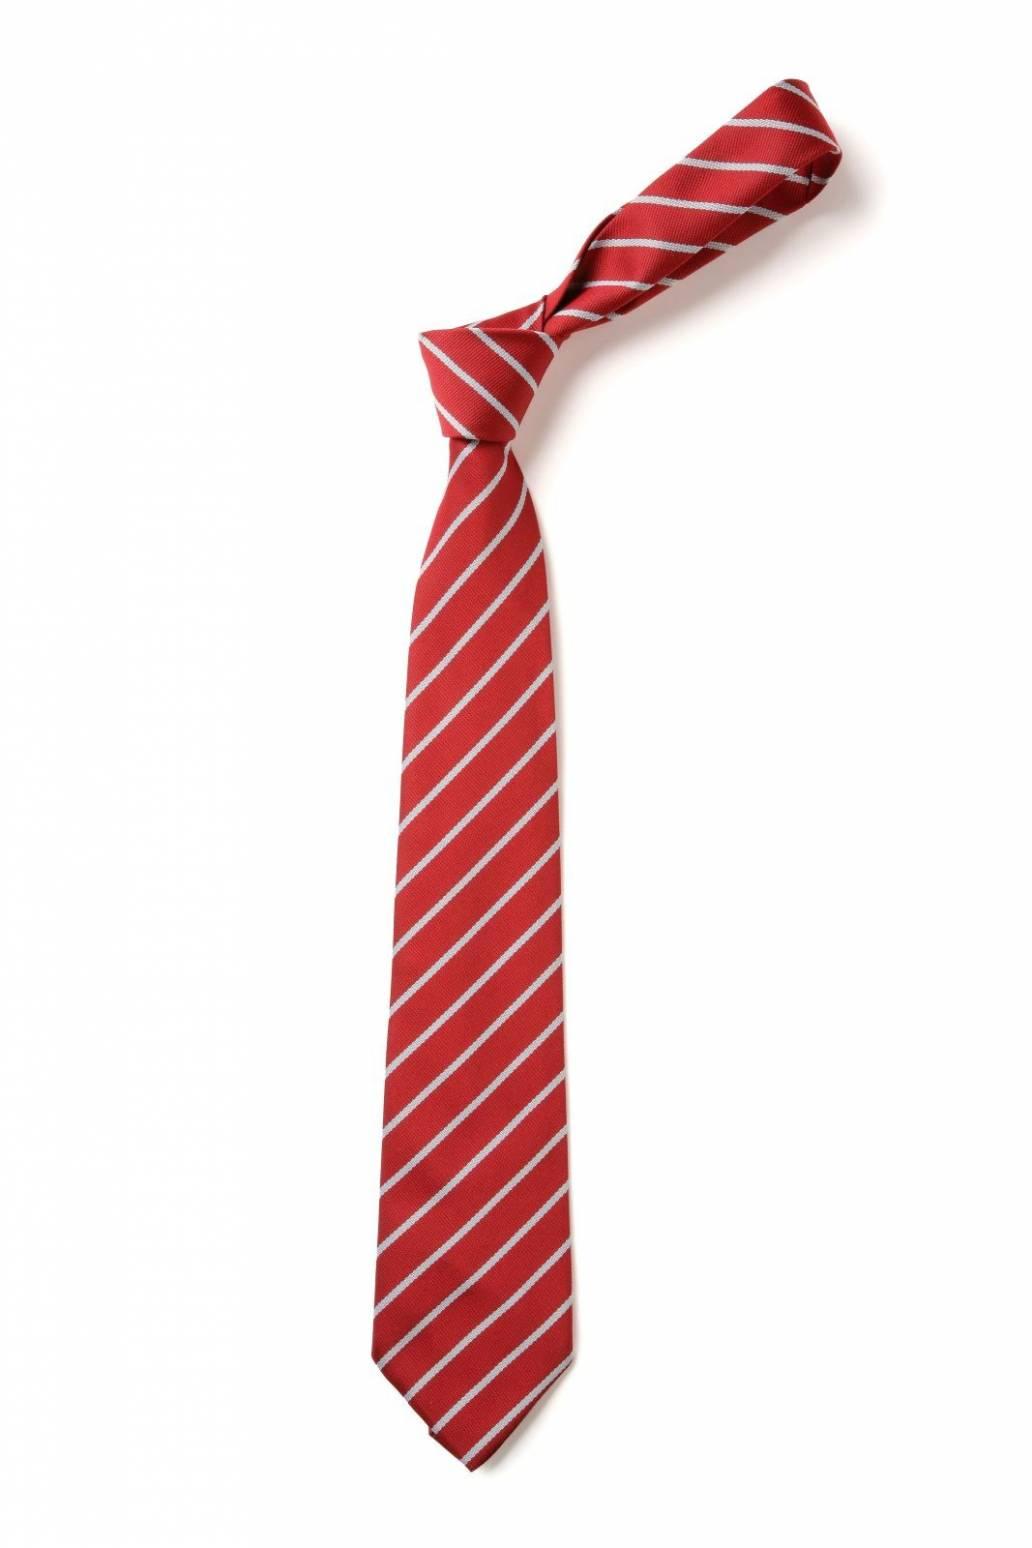 Blackpool School Tie